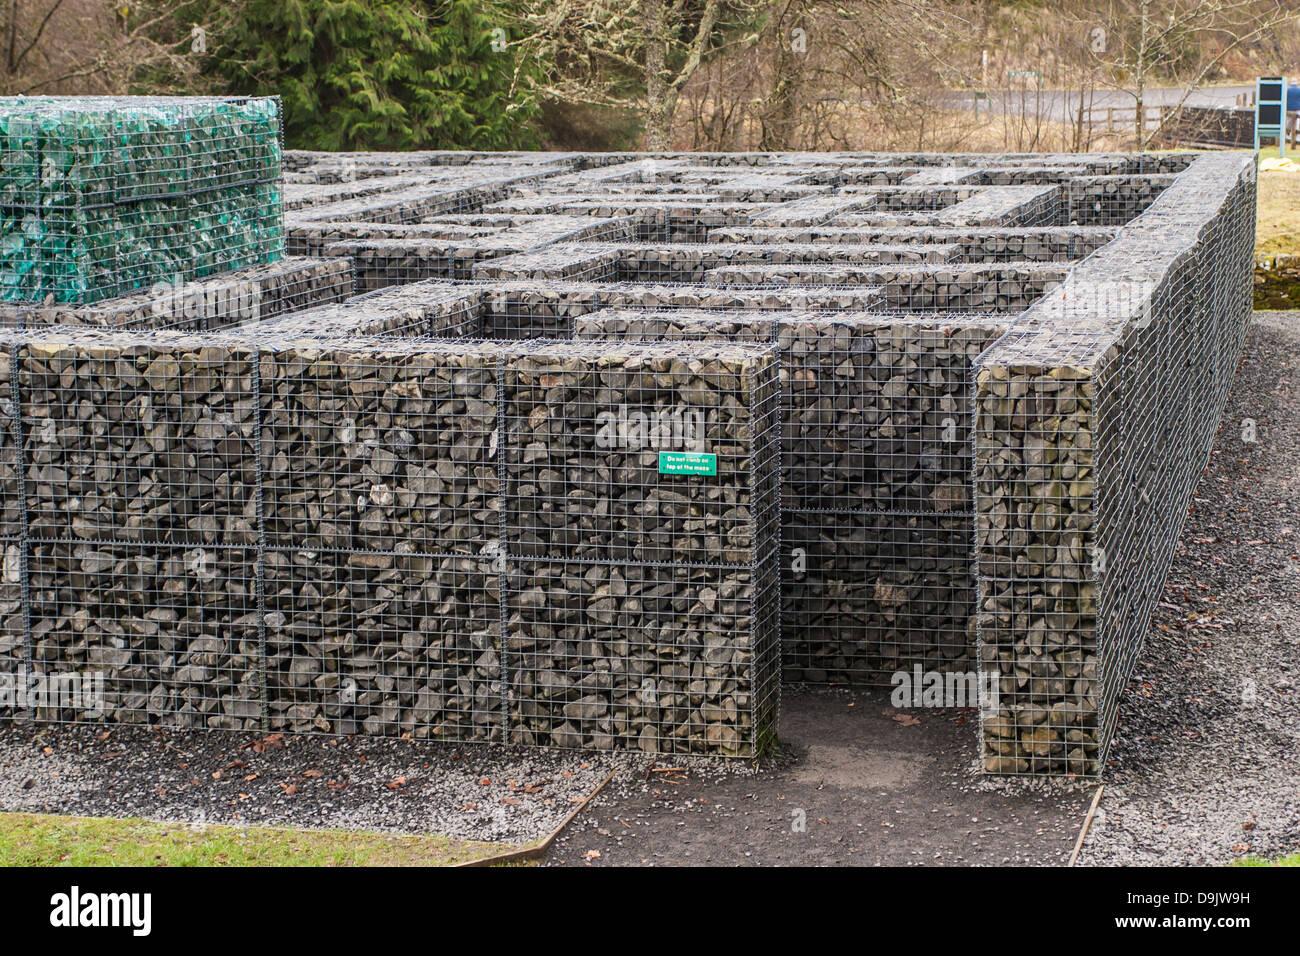 Minotaur Maze at Kielder Castle, Northumberland. - Stock Image